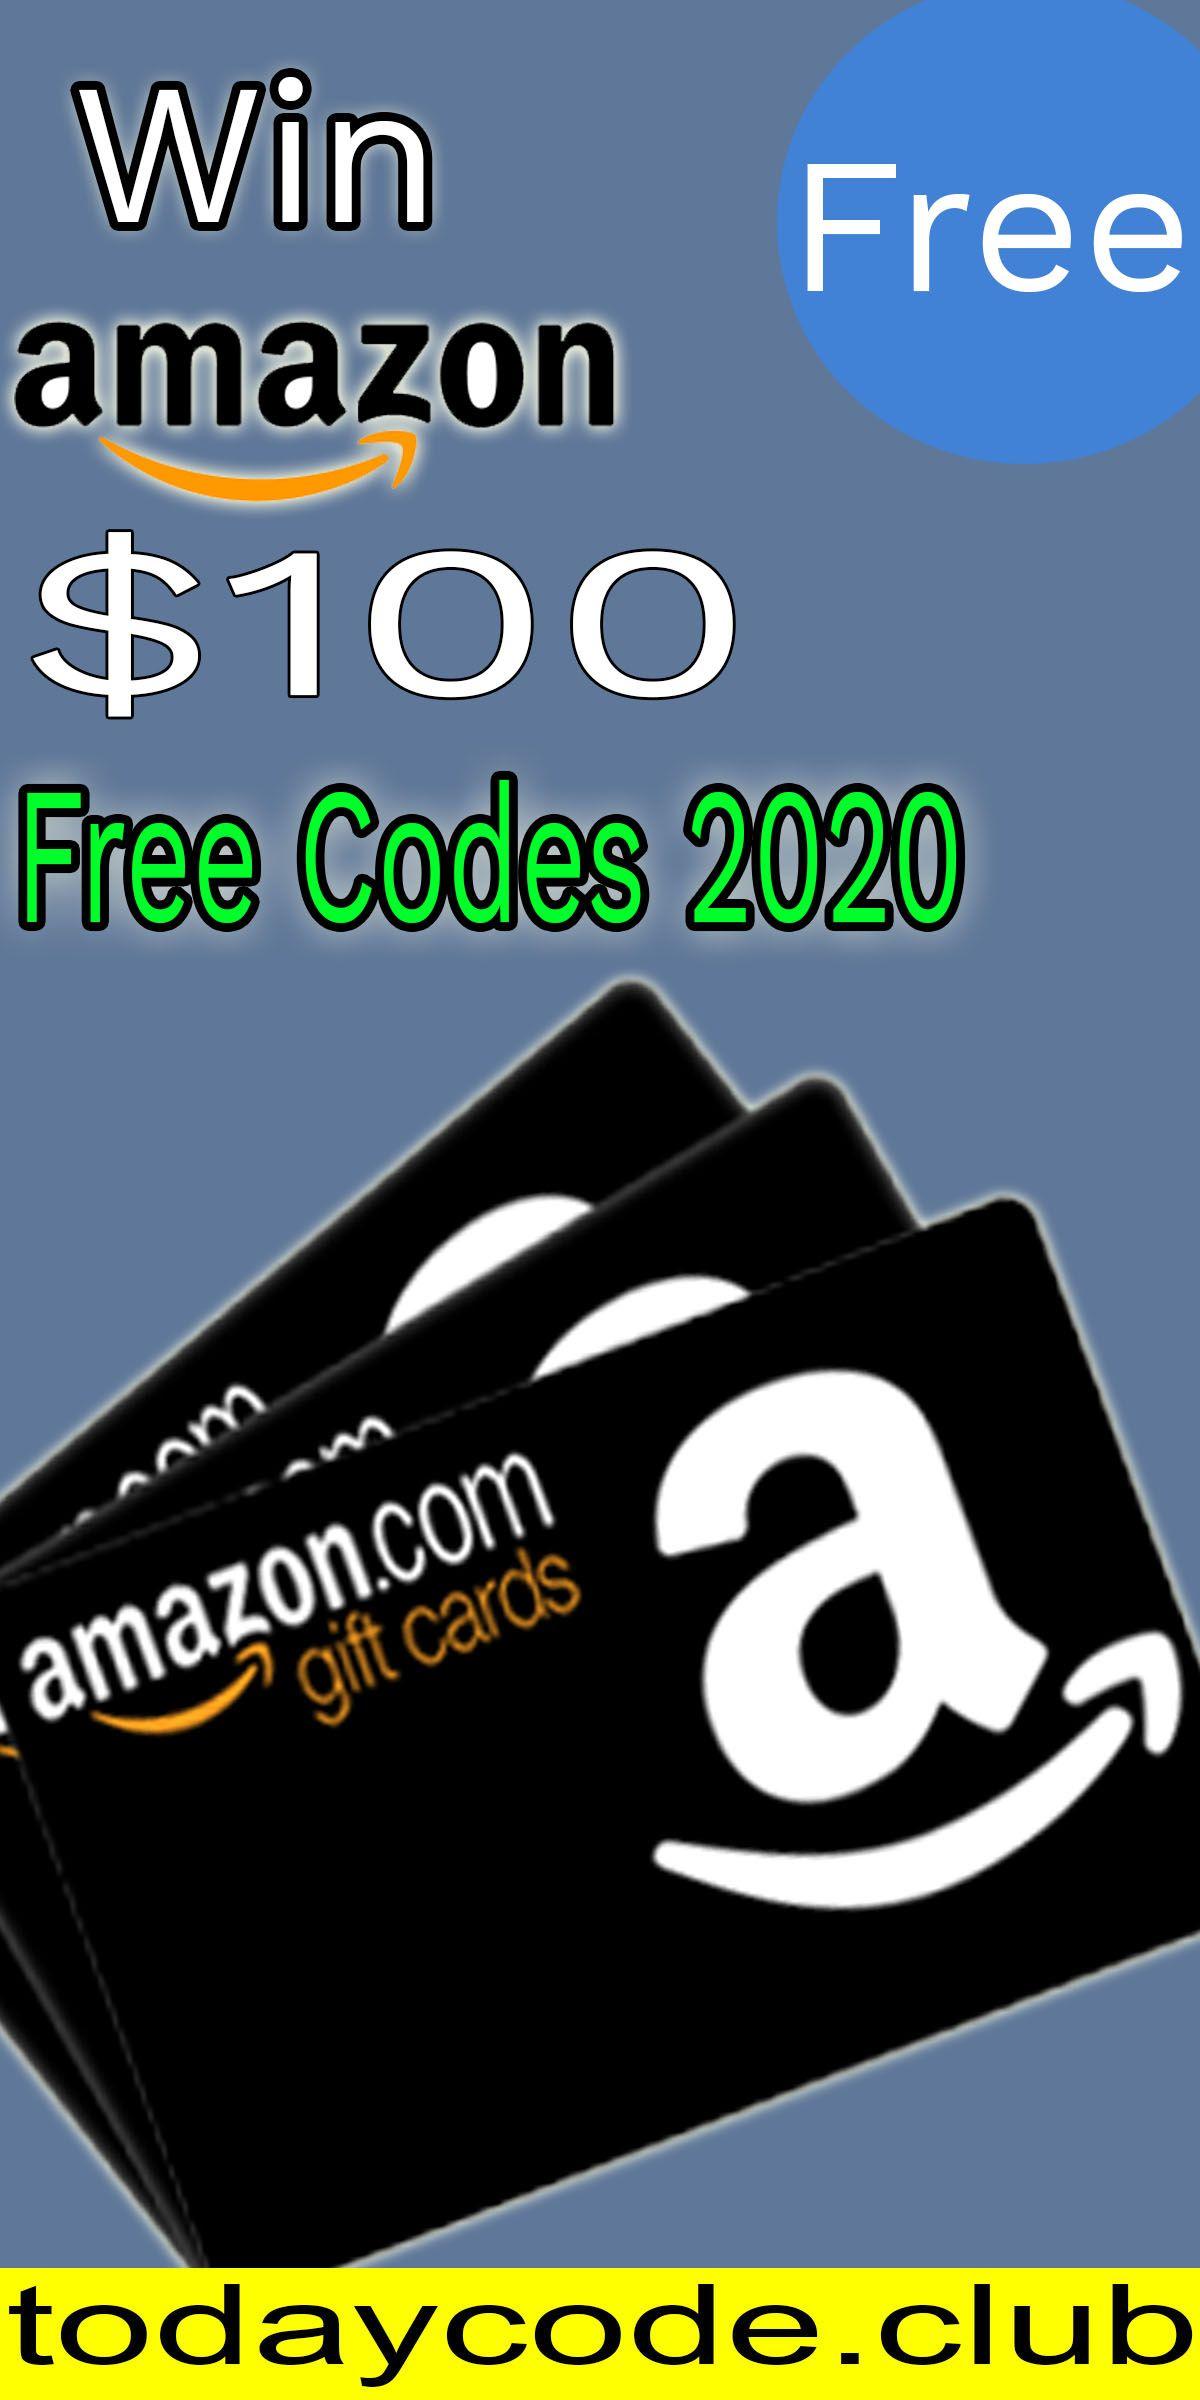 Amazon Gift Card Generator No Human Verification 2021 In 2021 Amazon Gift Card Free Amazon Gift Cards Gift Card Generator